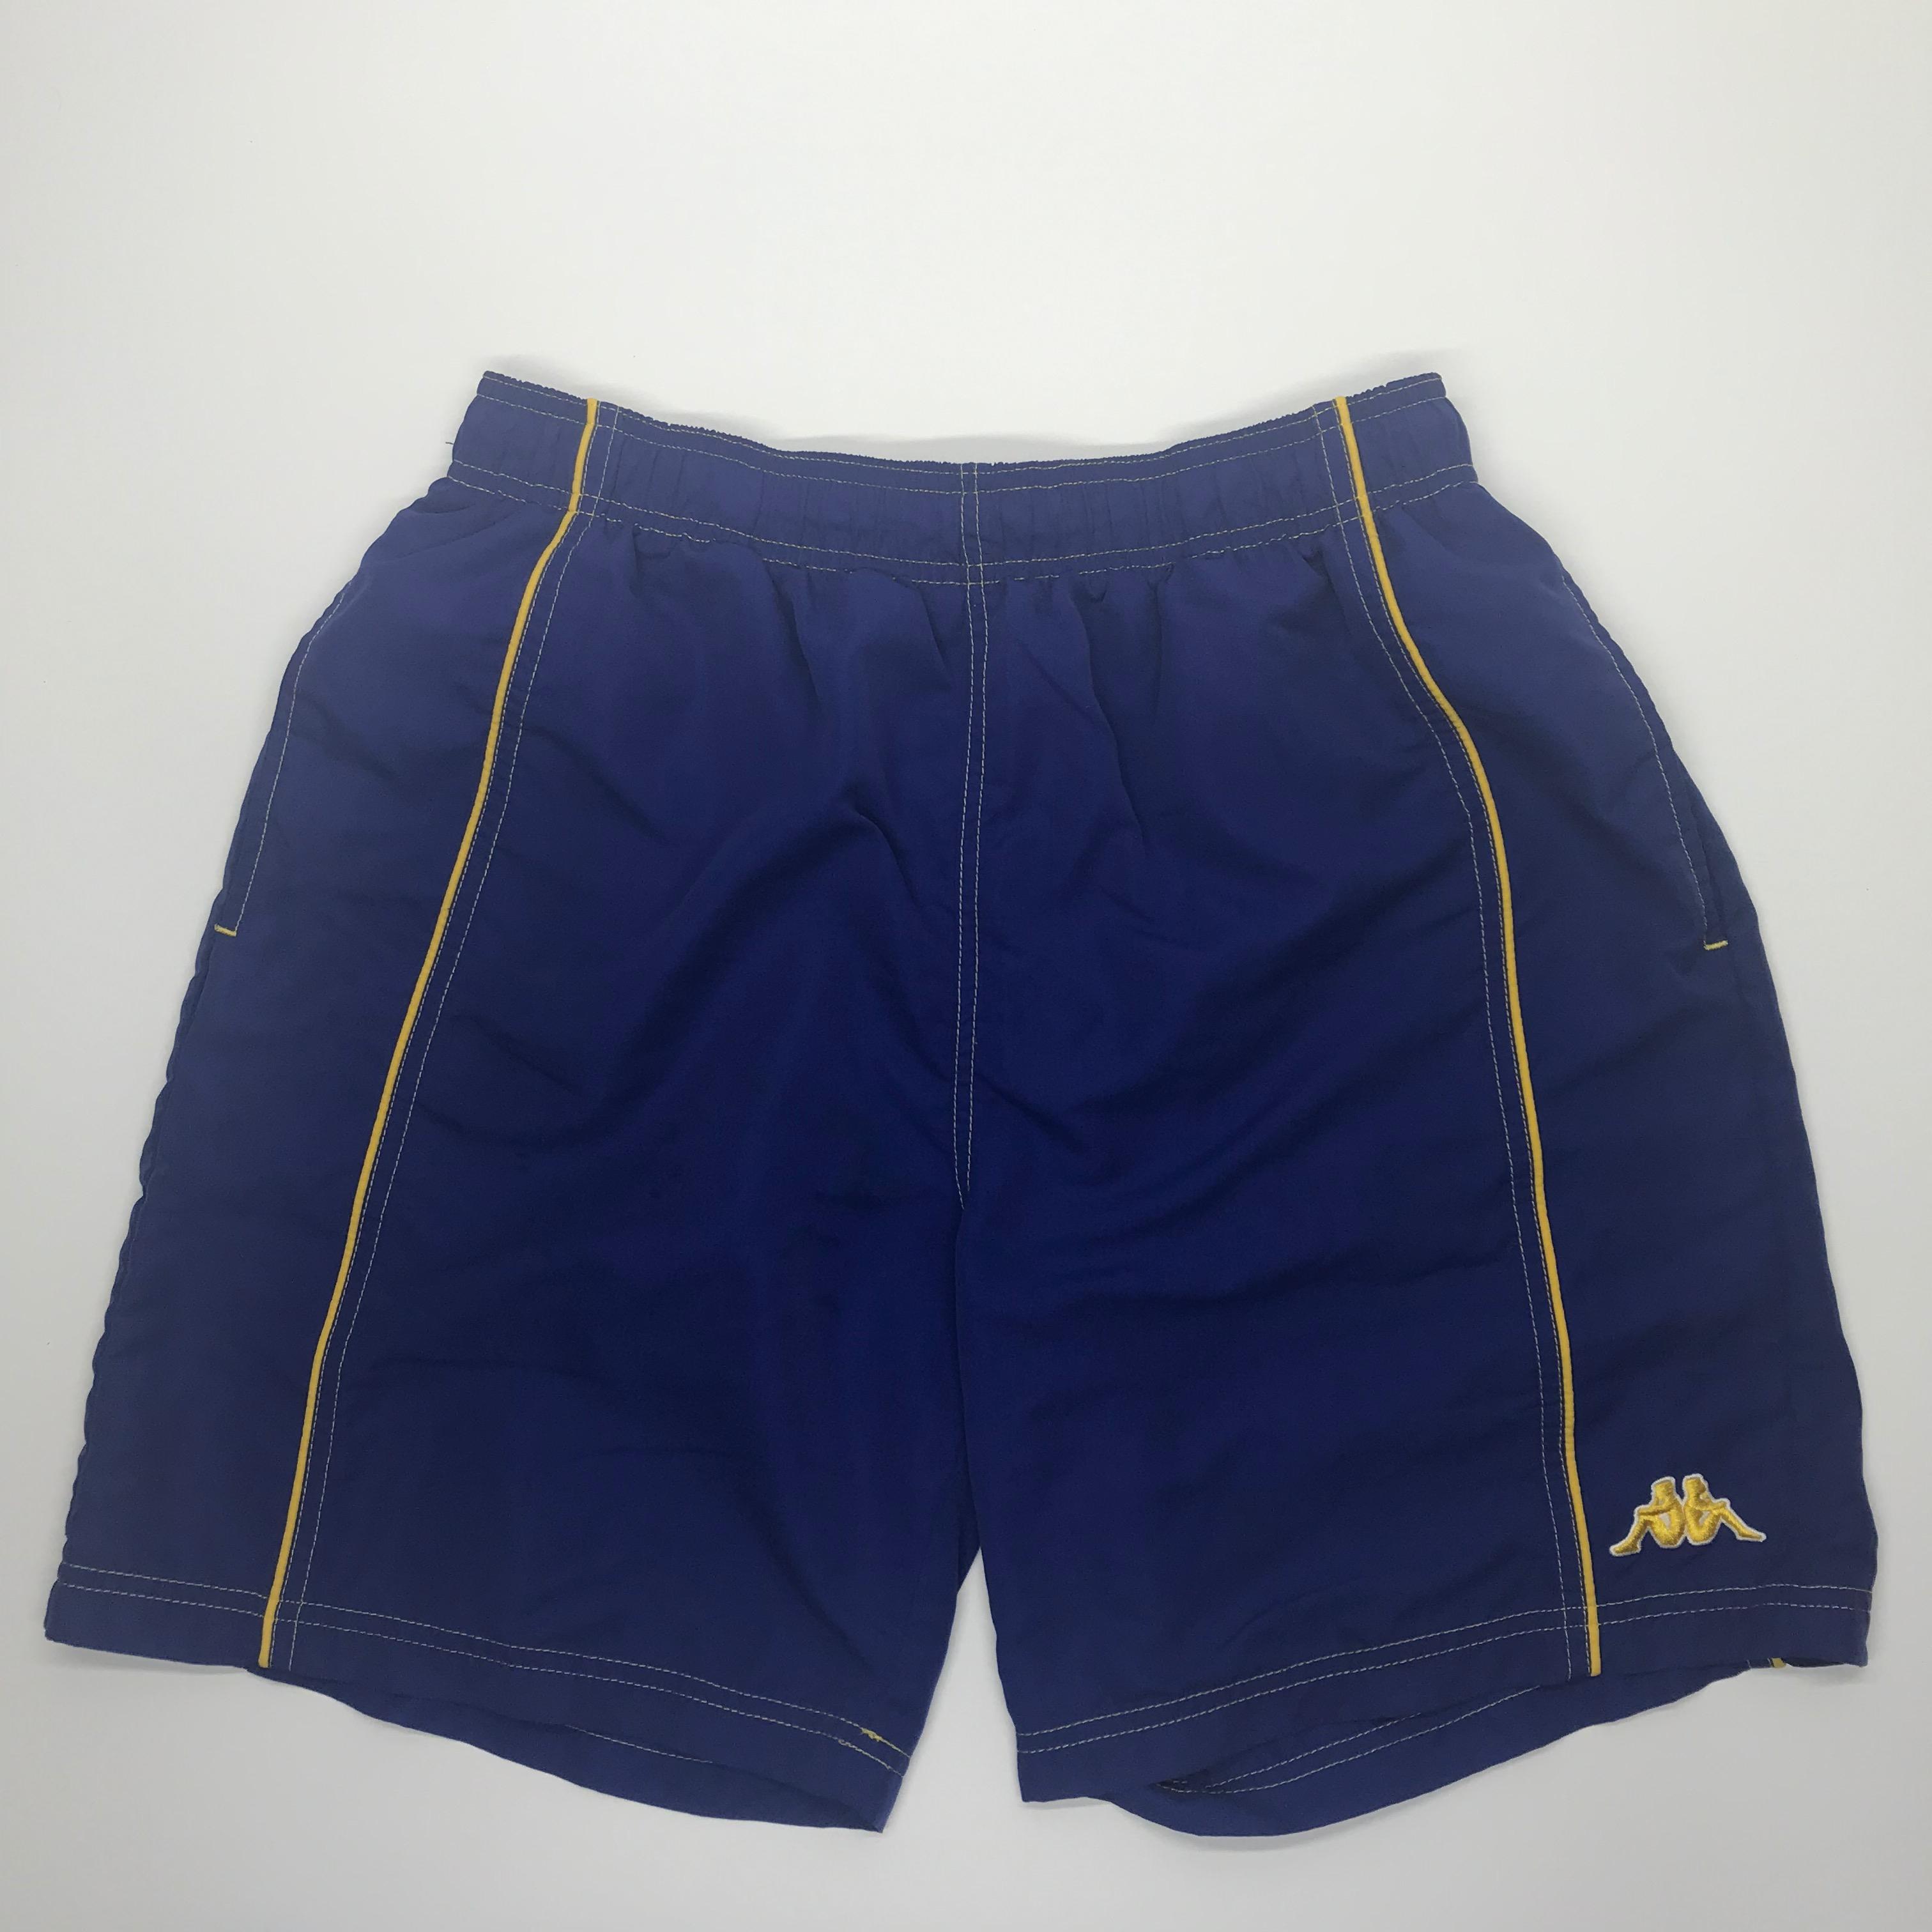 Pantalon Corto Kappa (L) image